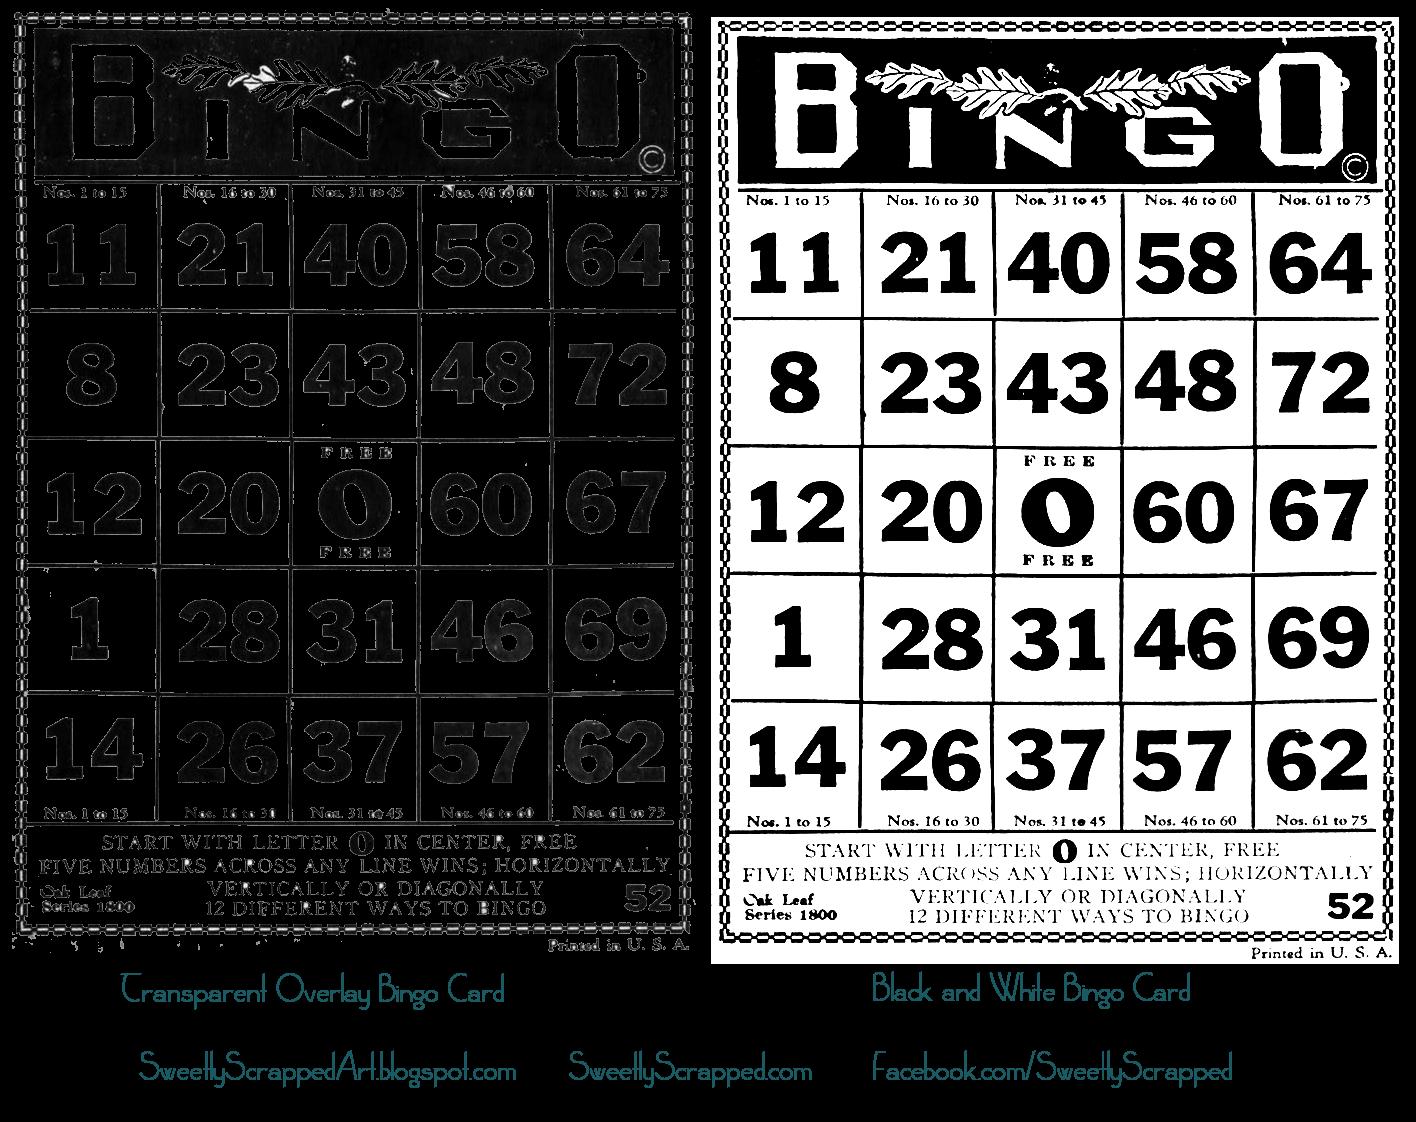 Bingo card clipart free svg transparent download Free Bingo Card Cliparts, Download Free Clip Art, Free Clip Art on ... svg transparent download